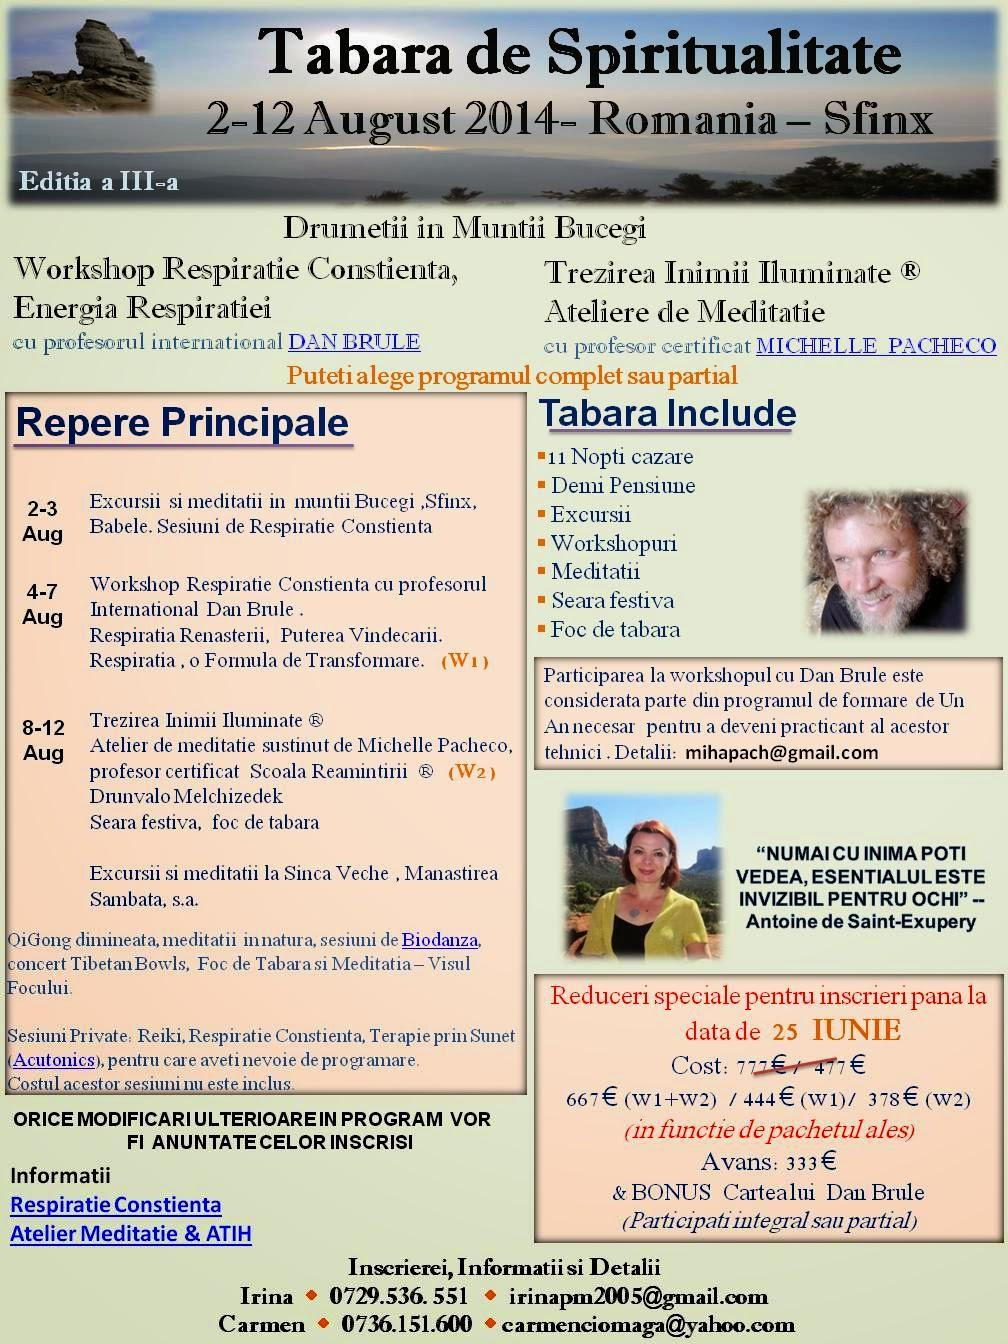 http://trezirea-inimii.blogspot.ro/p/tabara-de-spiritualitate.html